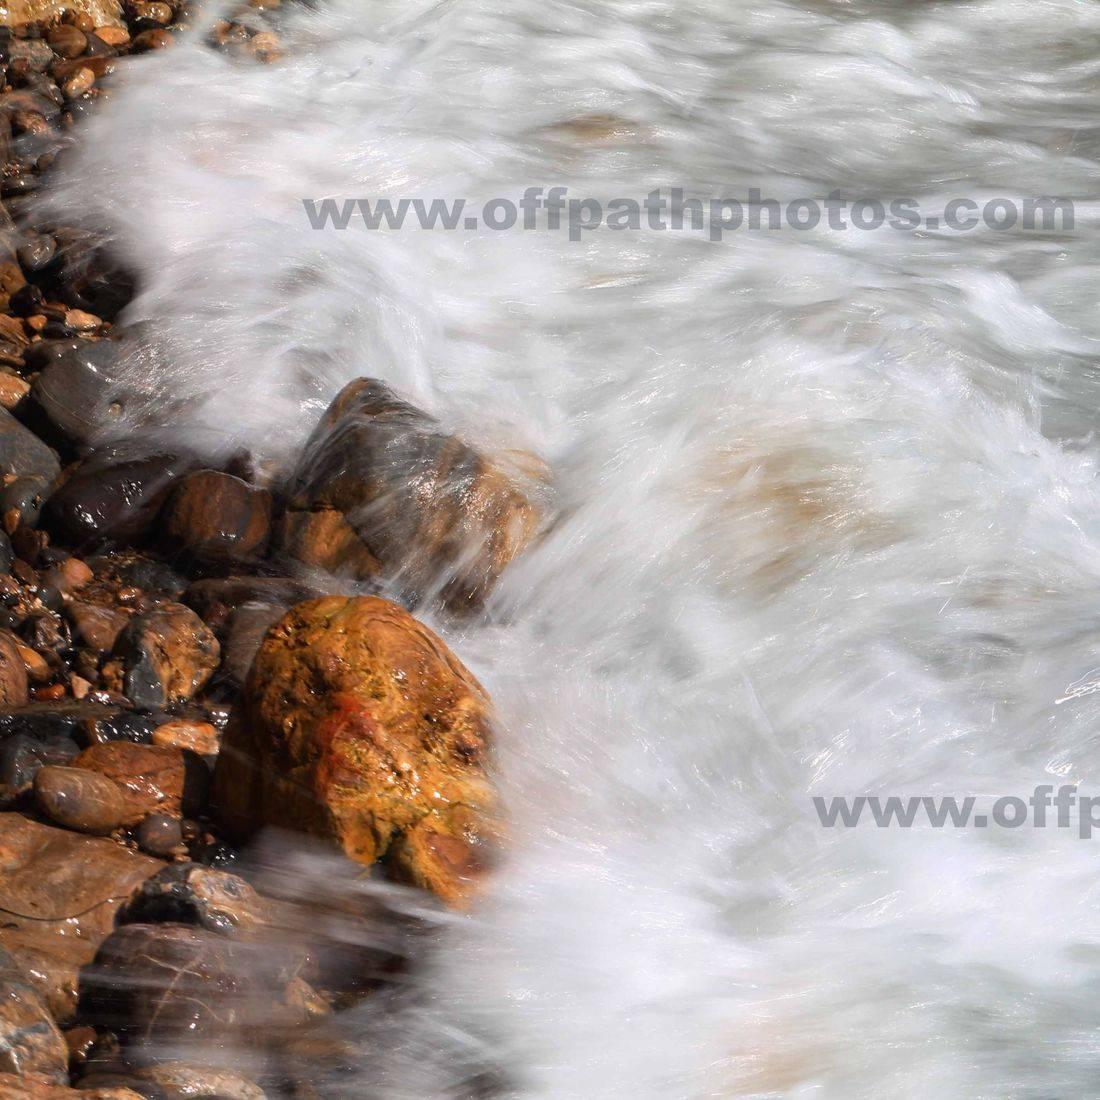 photography, nature, water, waves, rocks, sounds, music, sea, ocean, beach